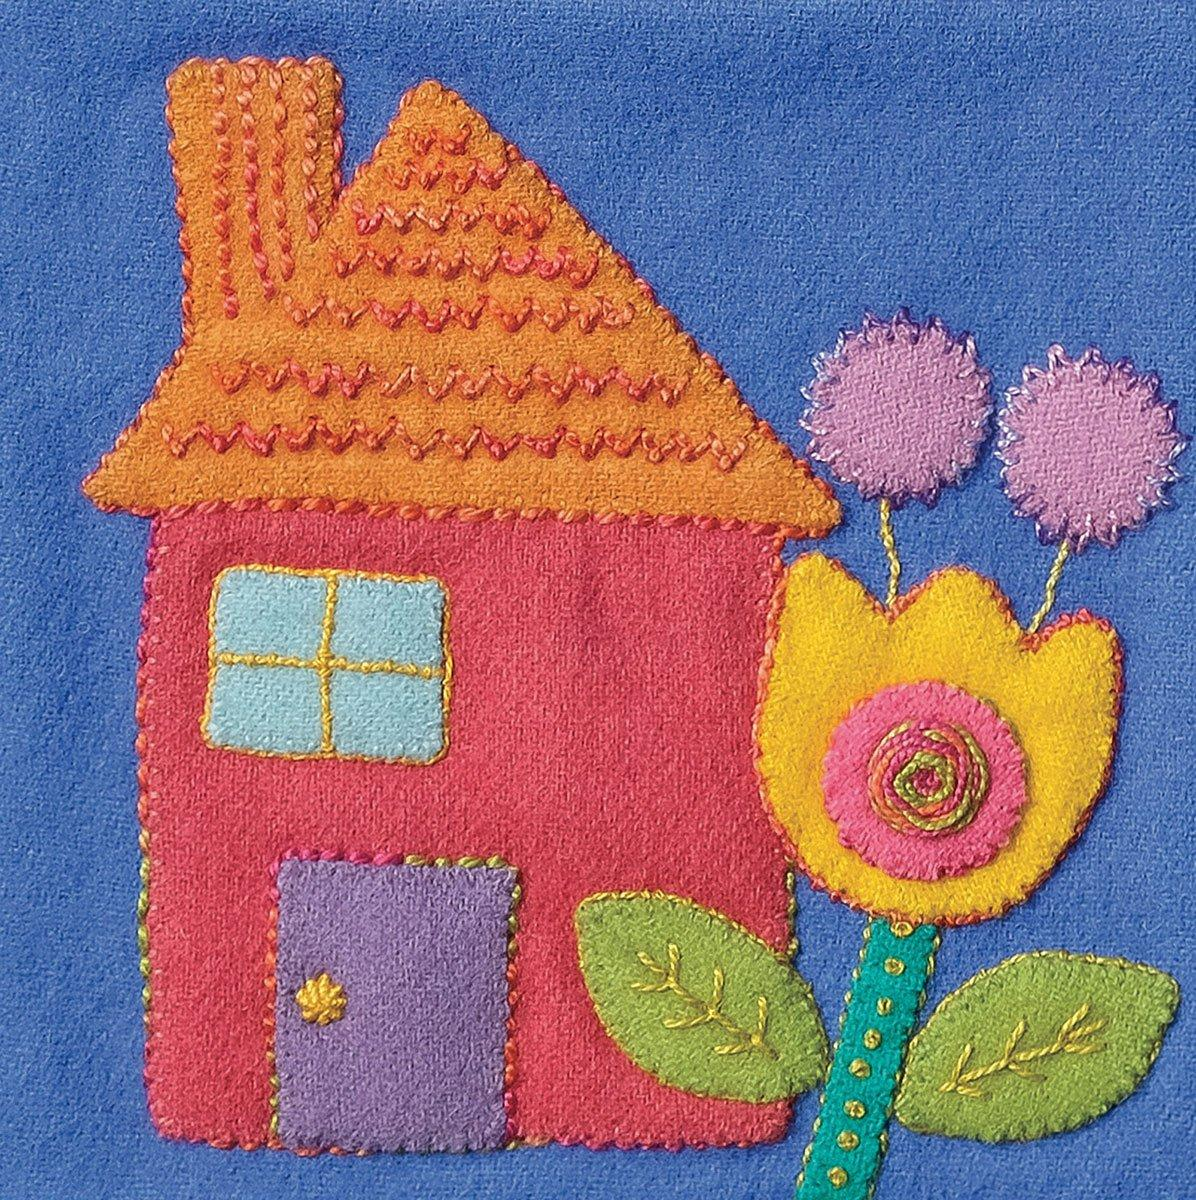 Sue Spargo Pre-Cut Wool Block Kit - House Colorway 3